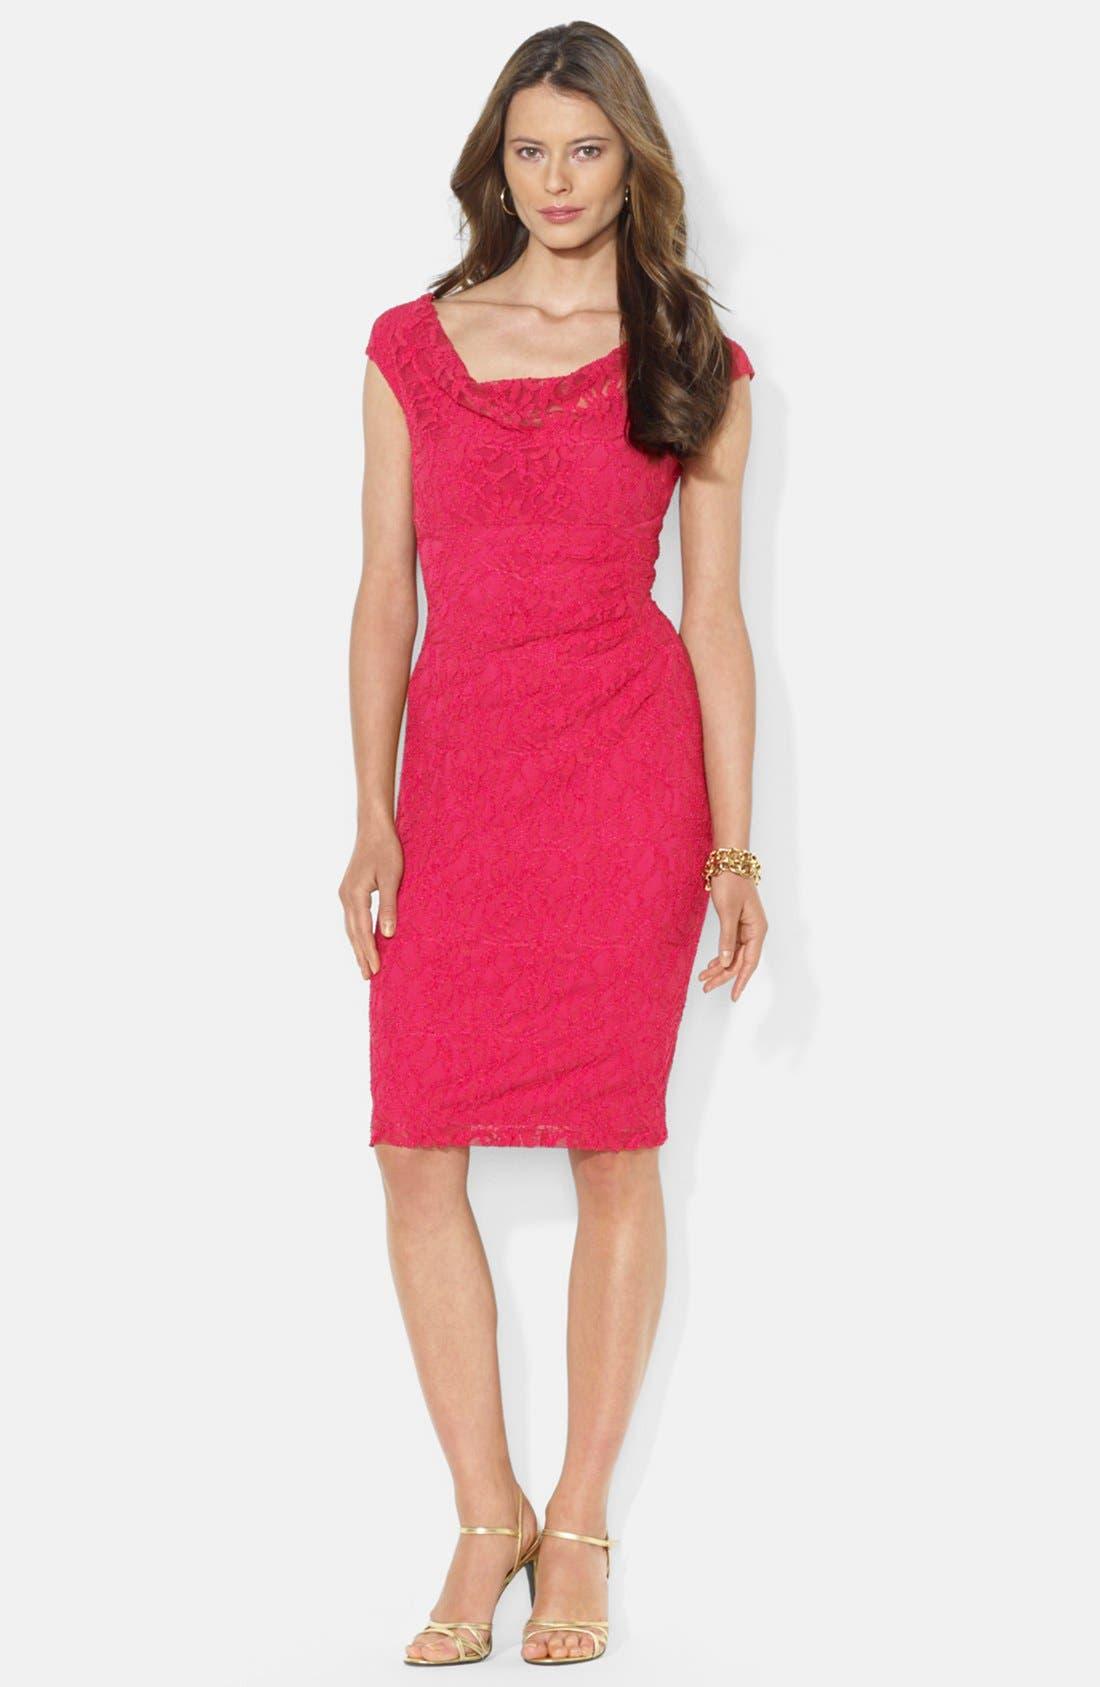 Alternate Image 1 Selected - Lauren Ralph Lauren Cowl Neck Stretch Lace Sheath Dress (Petite)